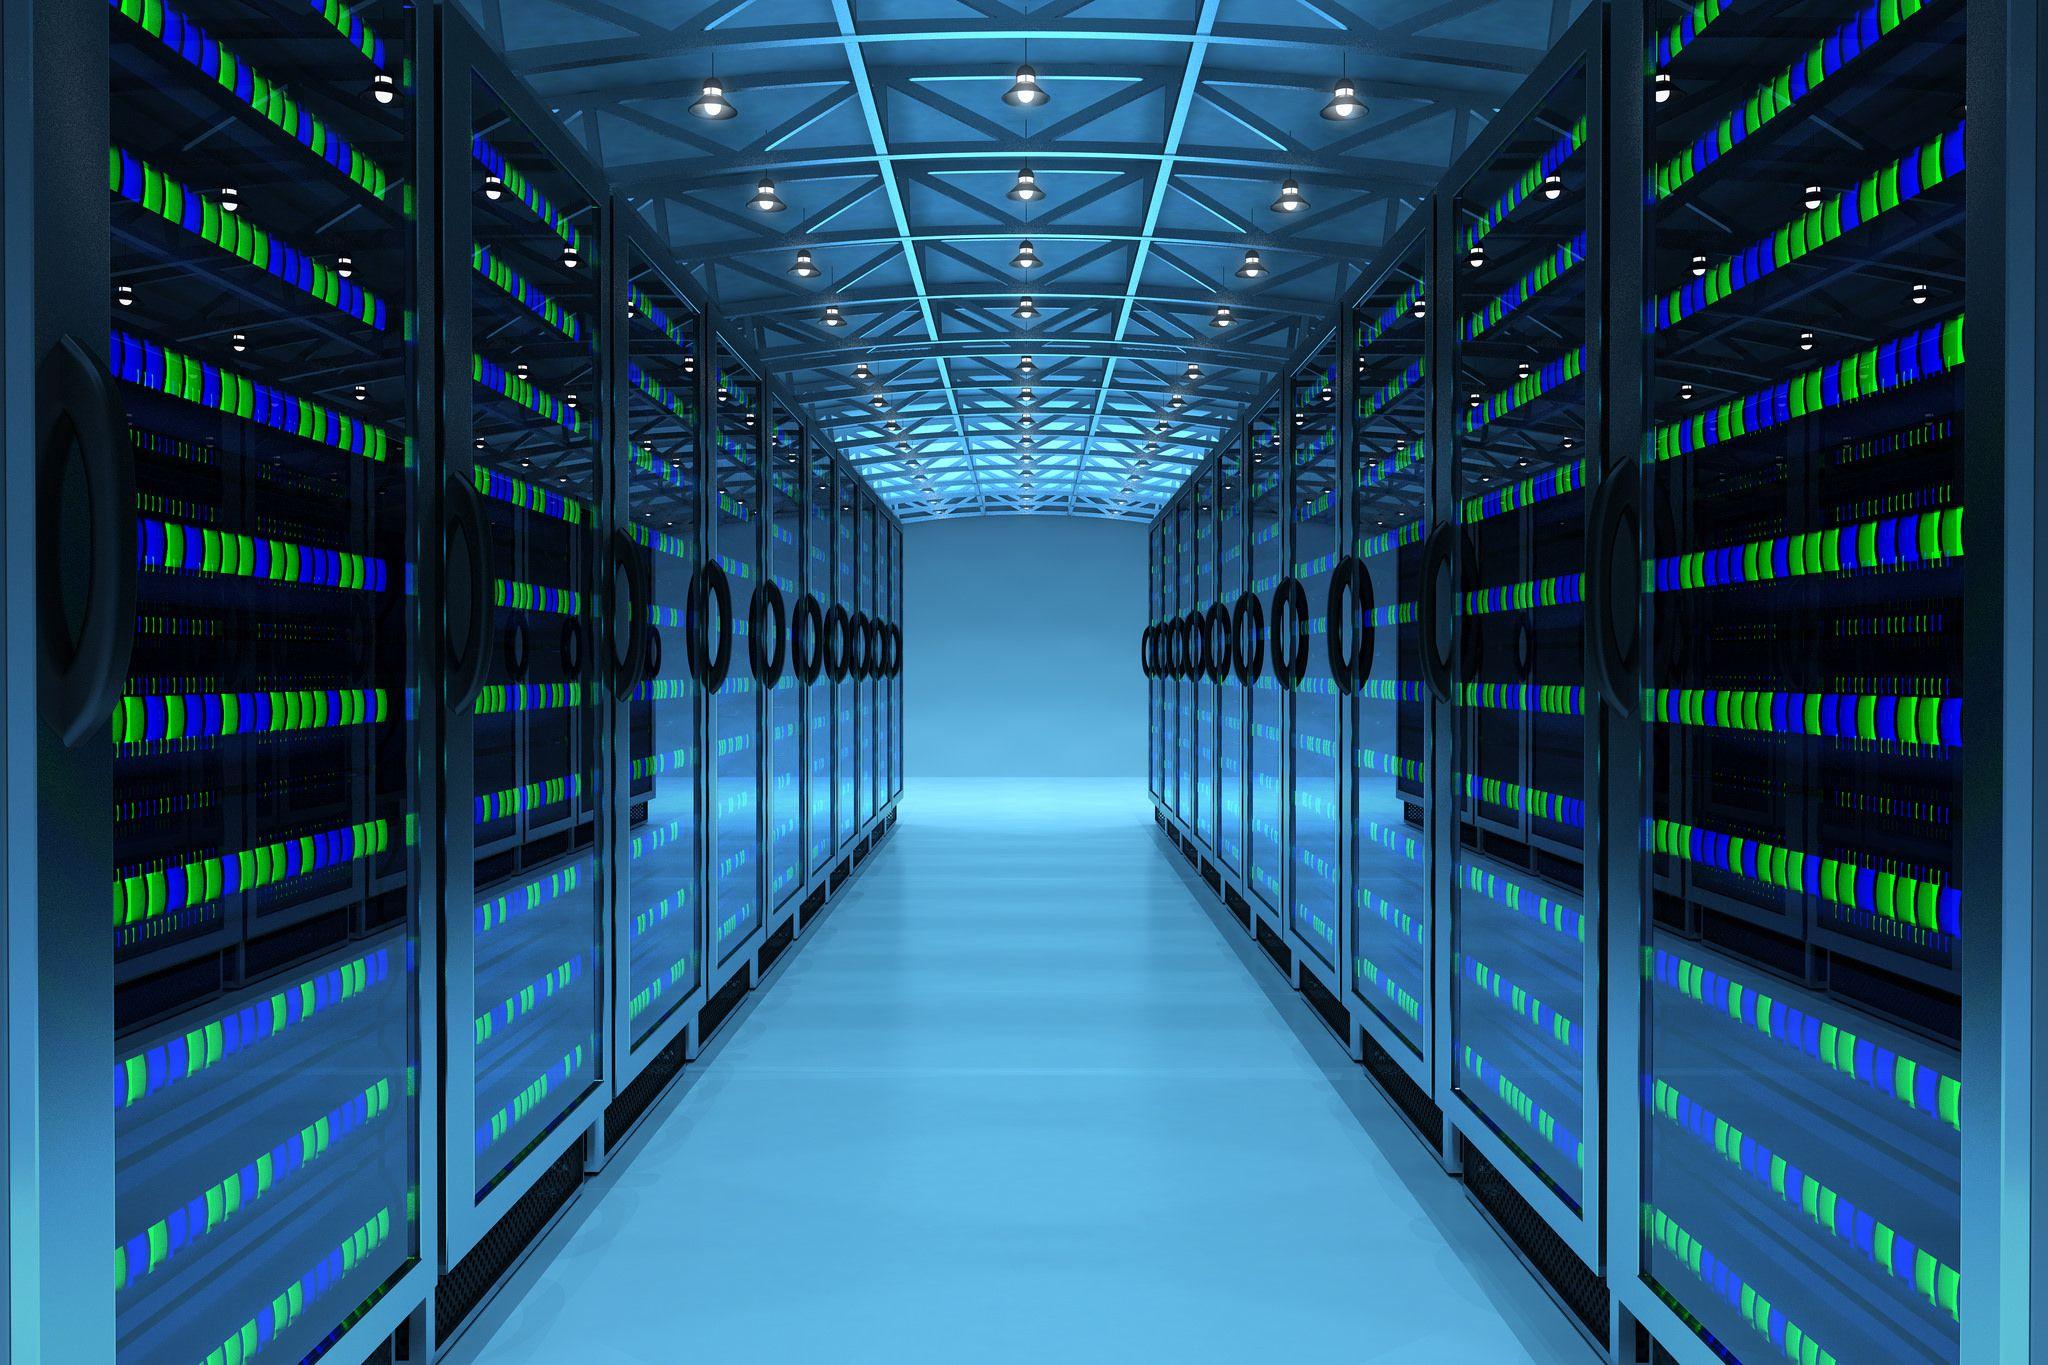 Server Hallway Machines Data Center Sql Server Reporting Services Microsoft Sql Server